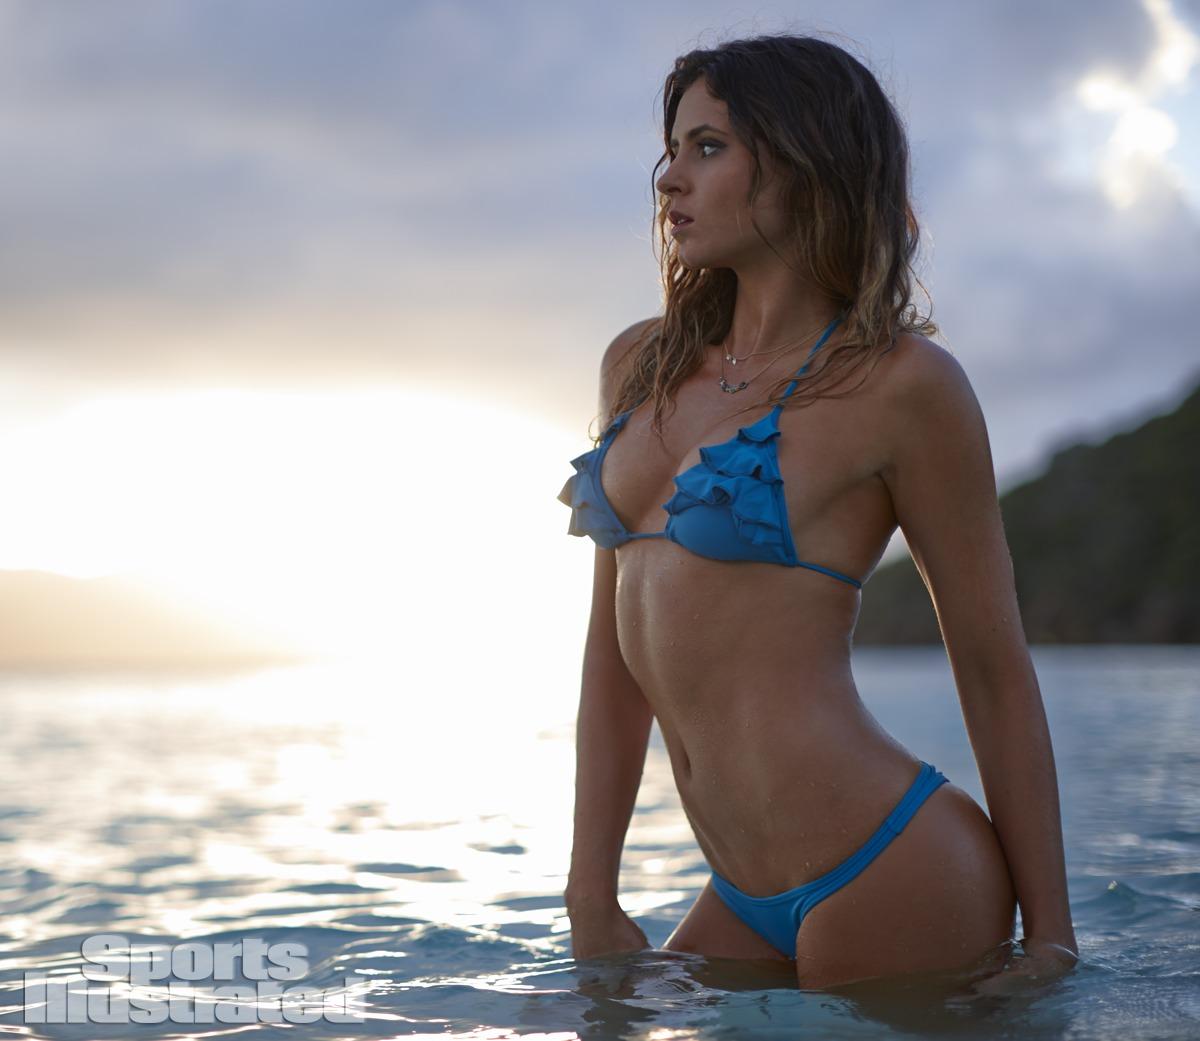 Images girls of jamacia nude-2819